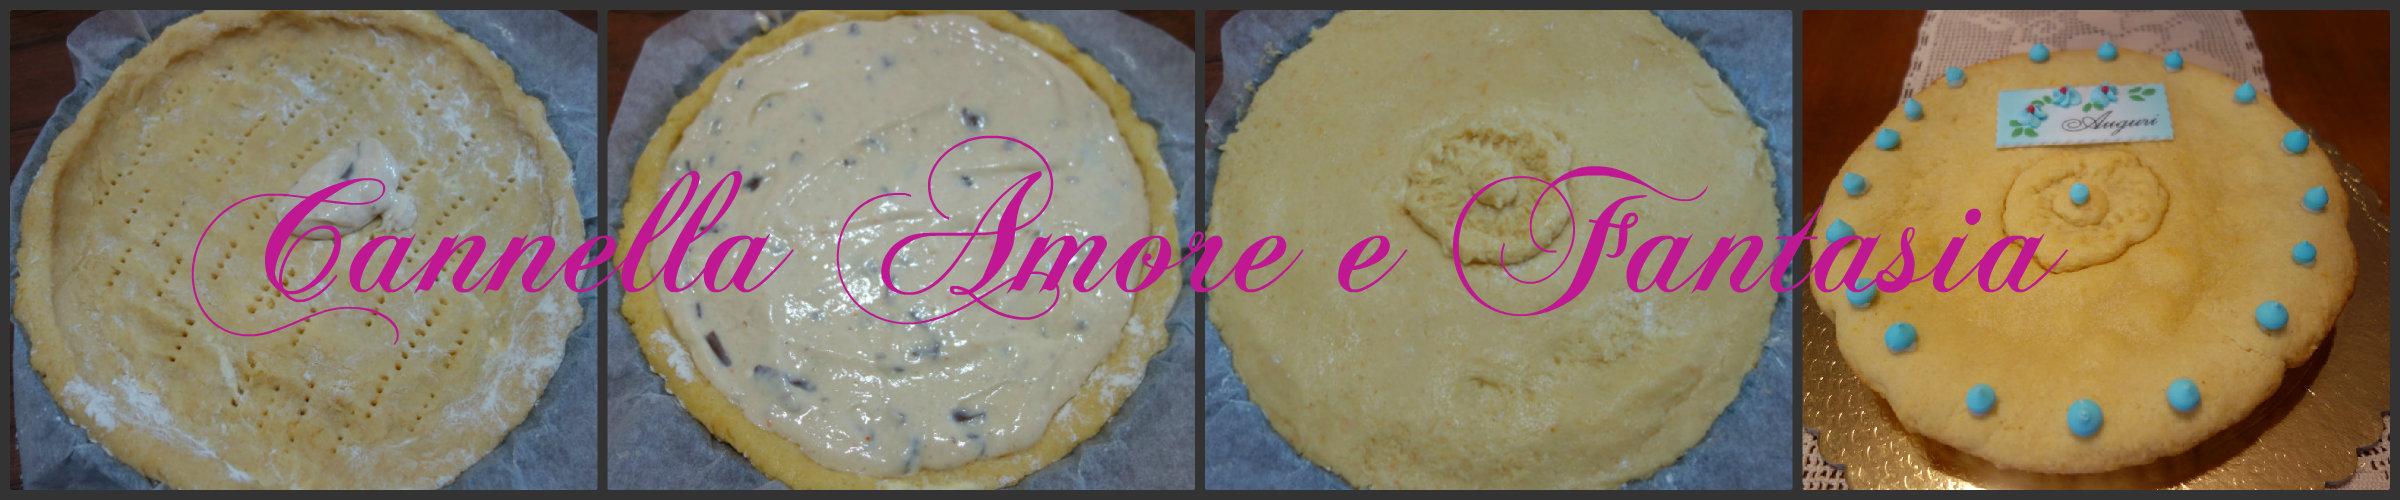 Collage cheesecake primavera ricotta e gianduia